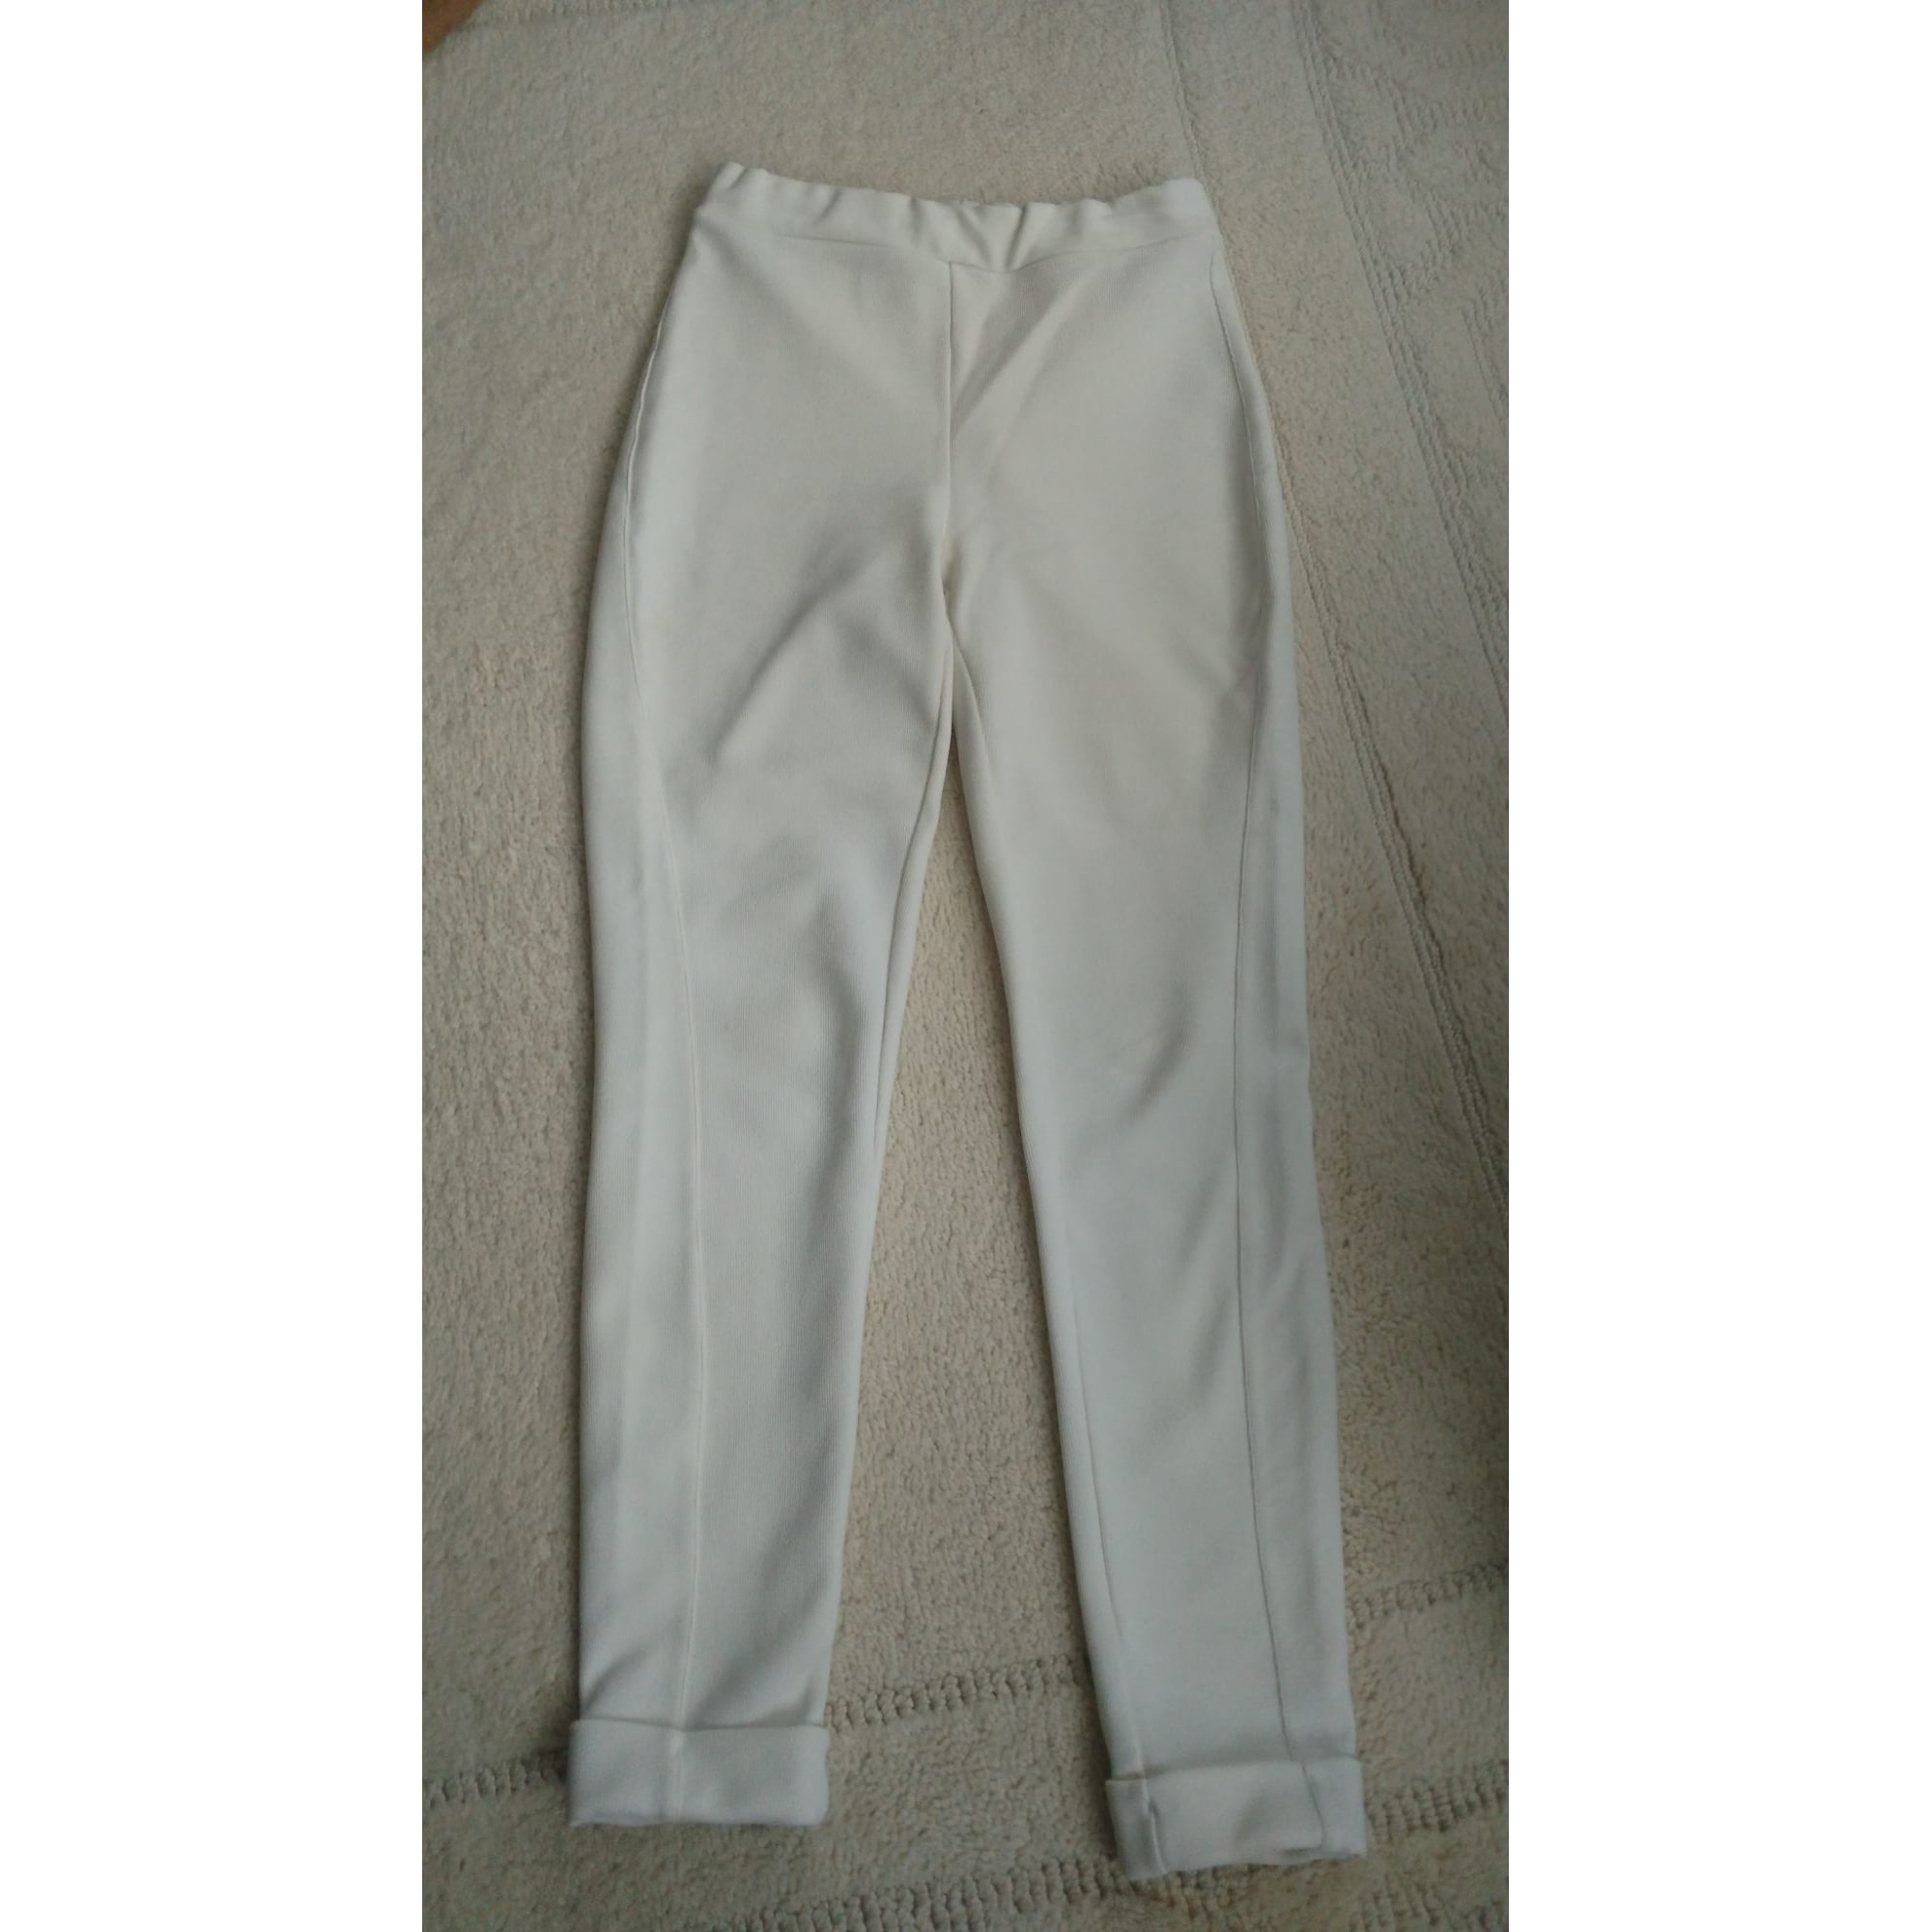 Pantalon slim, cigarette ALAIN MANOUKIAN Blanc, blanc cassé, écru